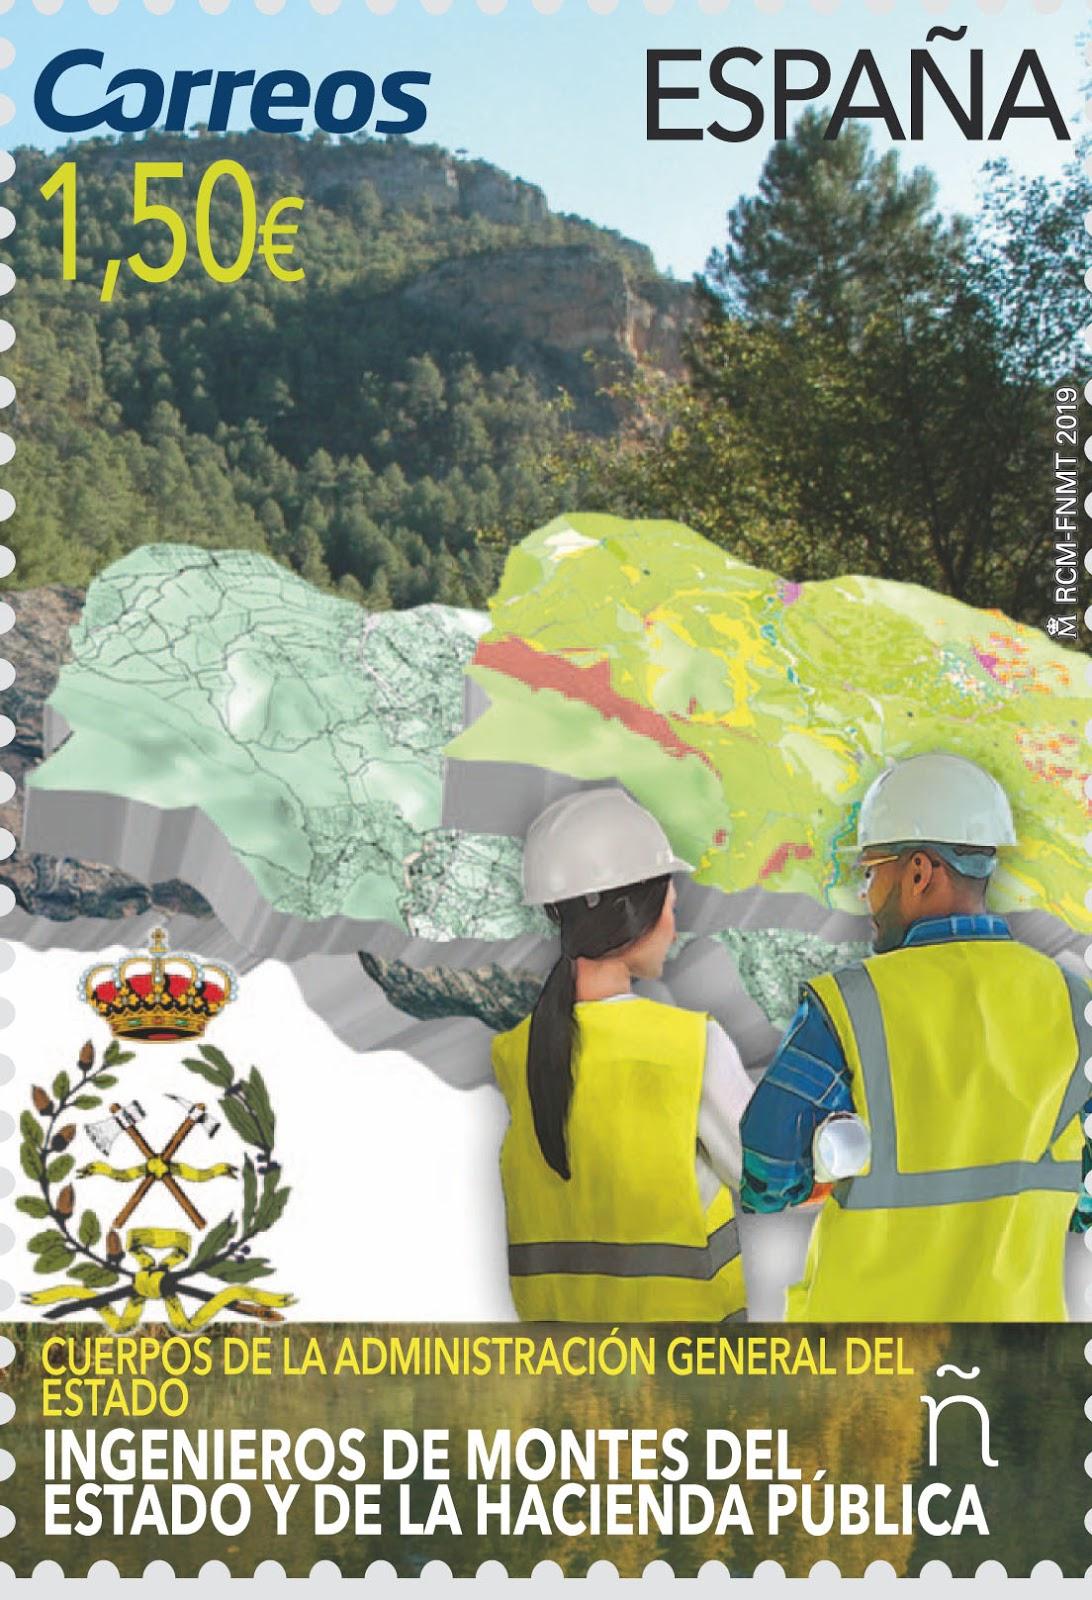 Ingenieros de Montes e Ingenieros Montes Hacienda Pública